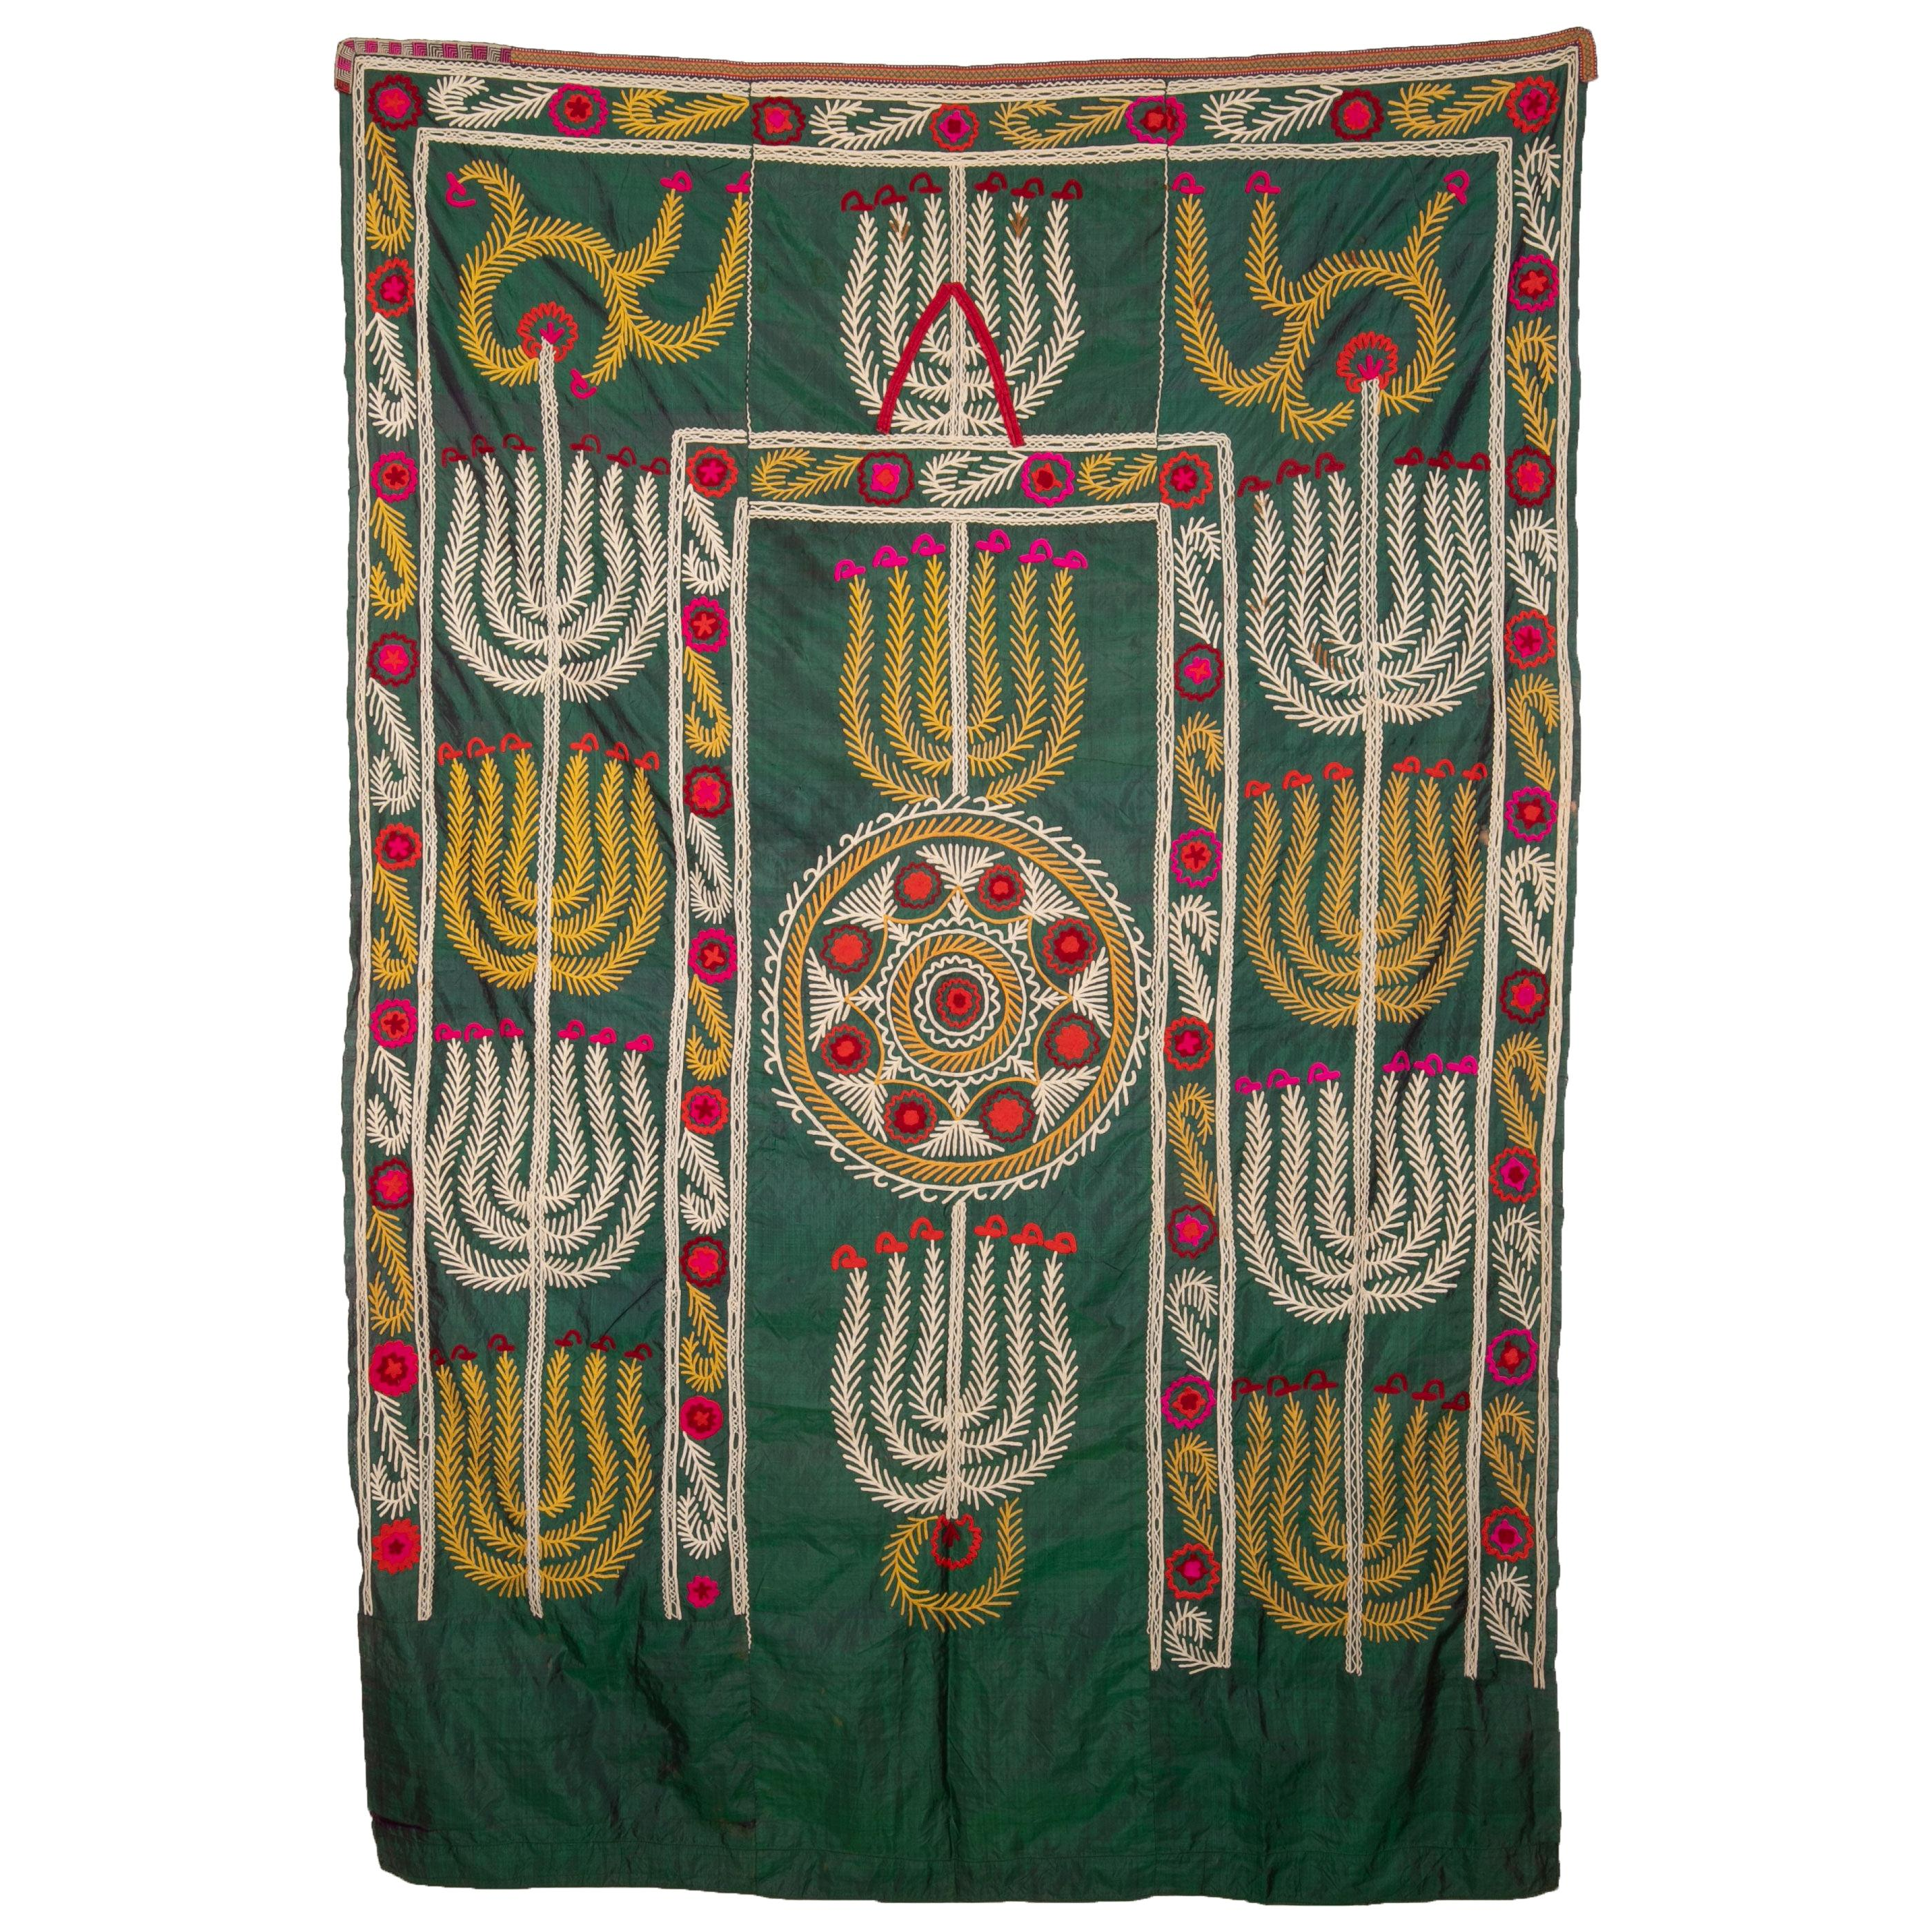 Antique Silk Suzani from Uzbekistan, Central Asia, 1900s